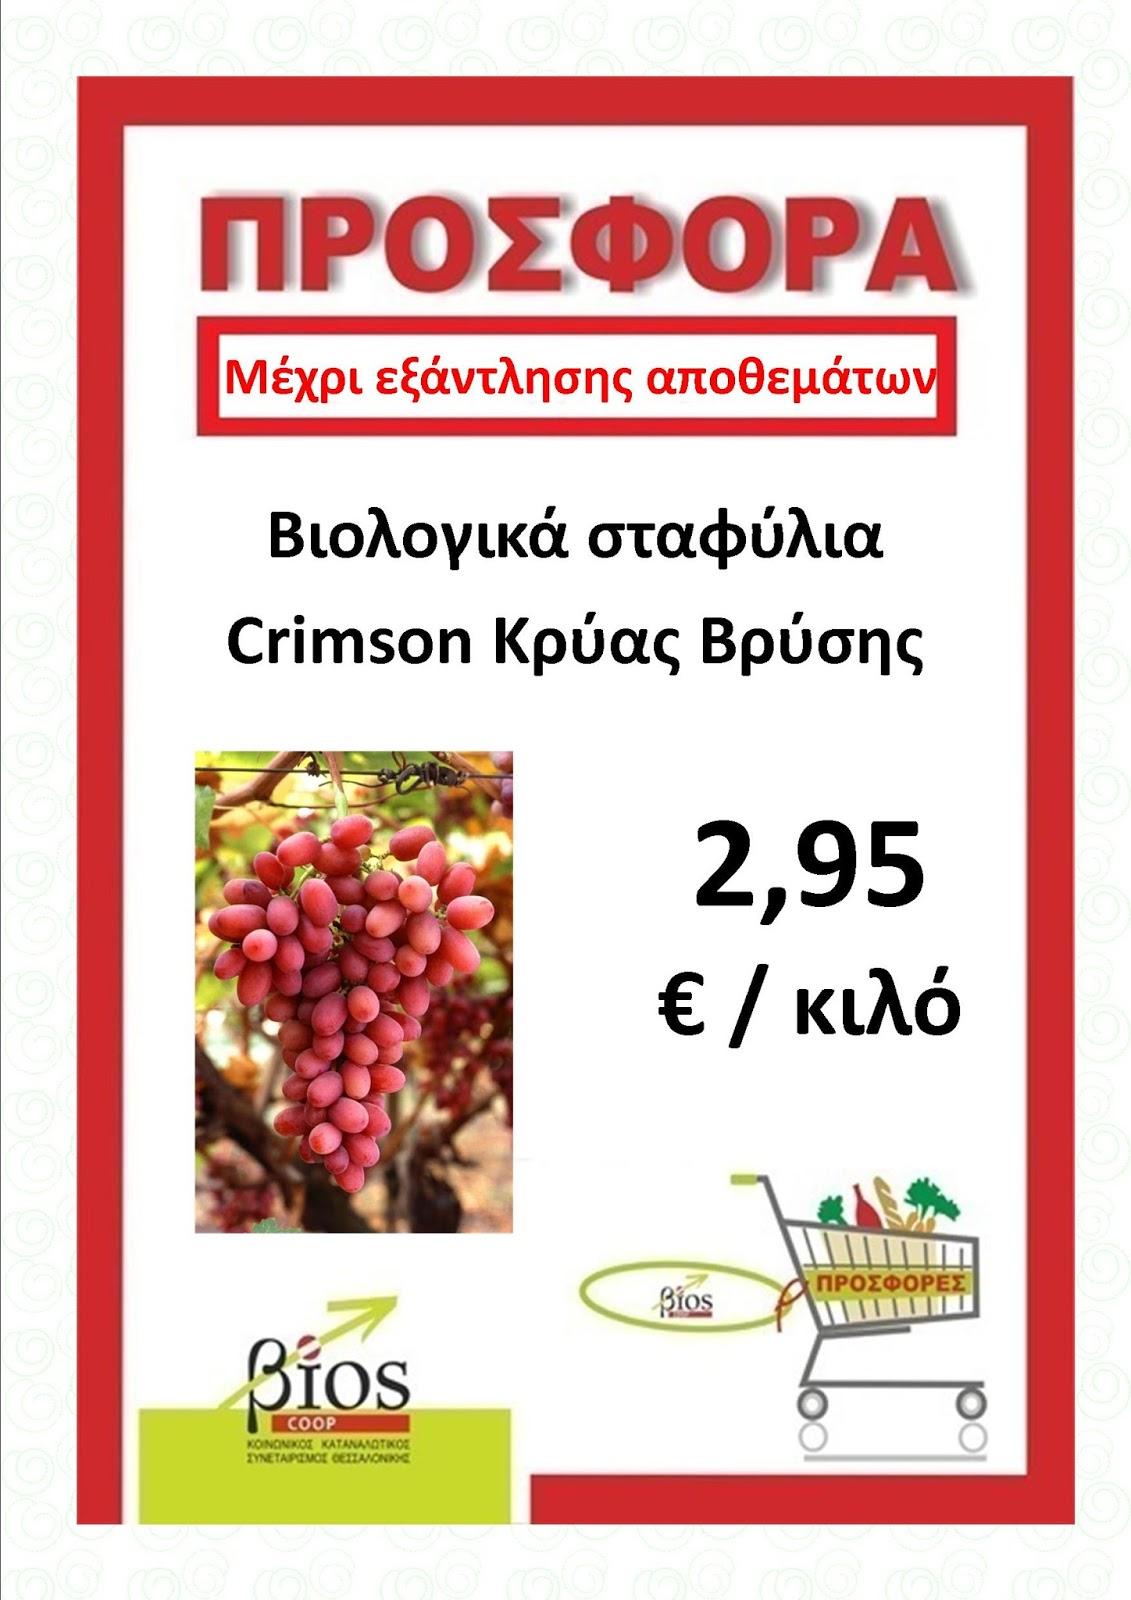 0f30b25a5303 Κοινωνικός Καταναλωτικός Συνεταιρισμός Θεσσαλονίκης